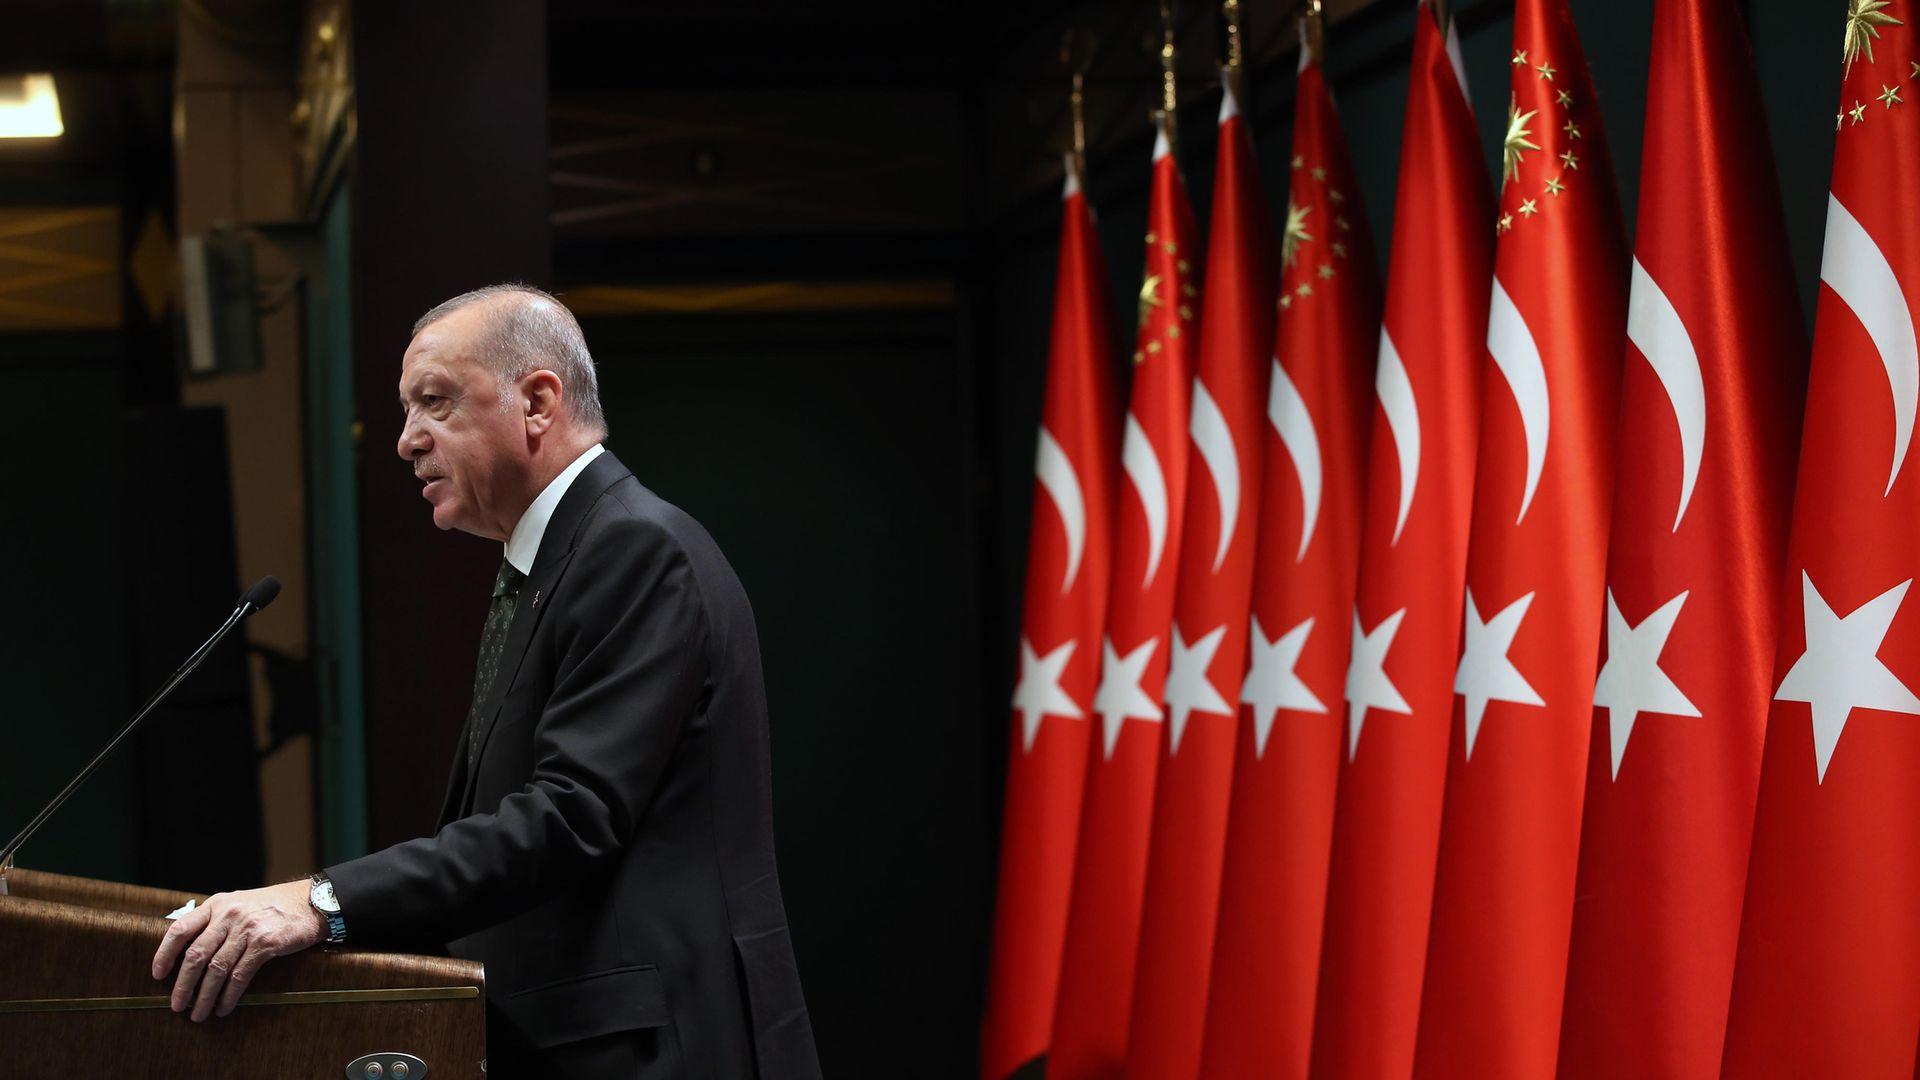 Turkish president Recep Tayyip Erdogan delivers a speech in Ankara in November 2020 - Credit: Anadolu Agency via Getty Images